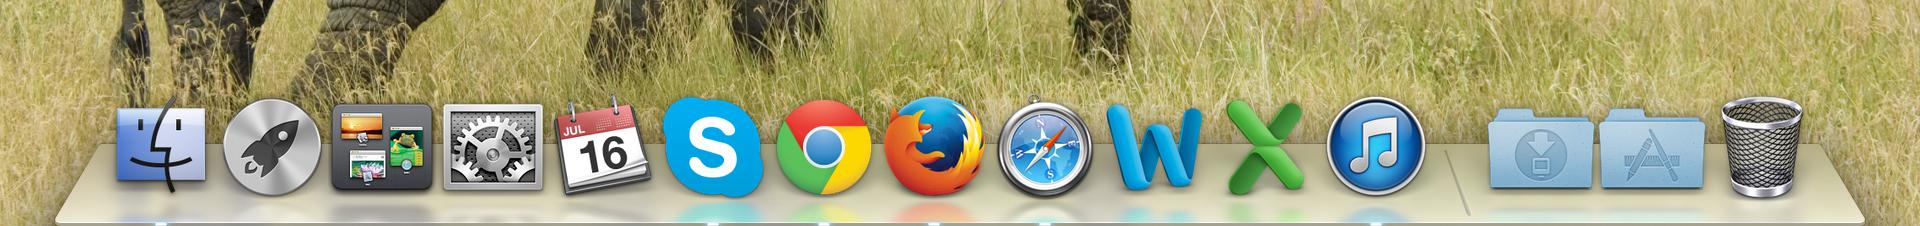 Dock o barra de programas en el sistema operativo Mac OS X.